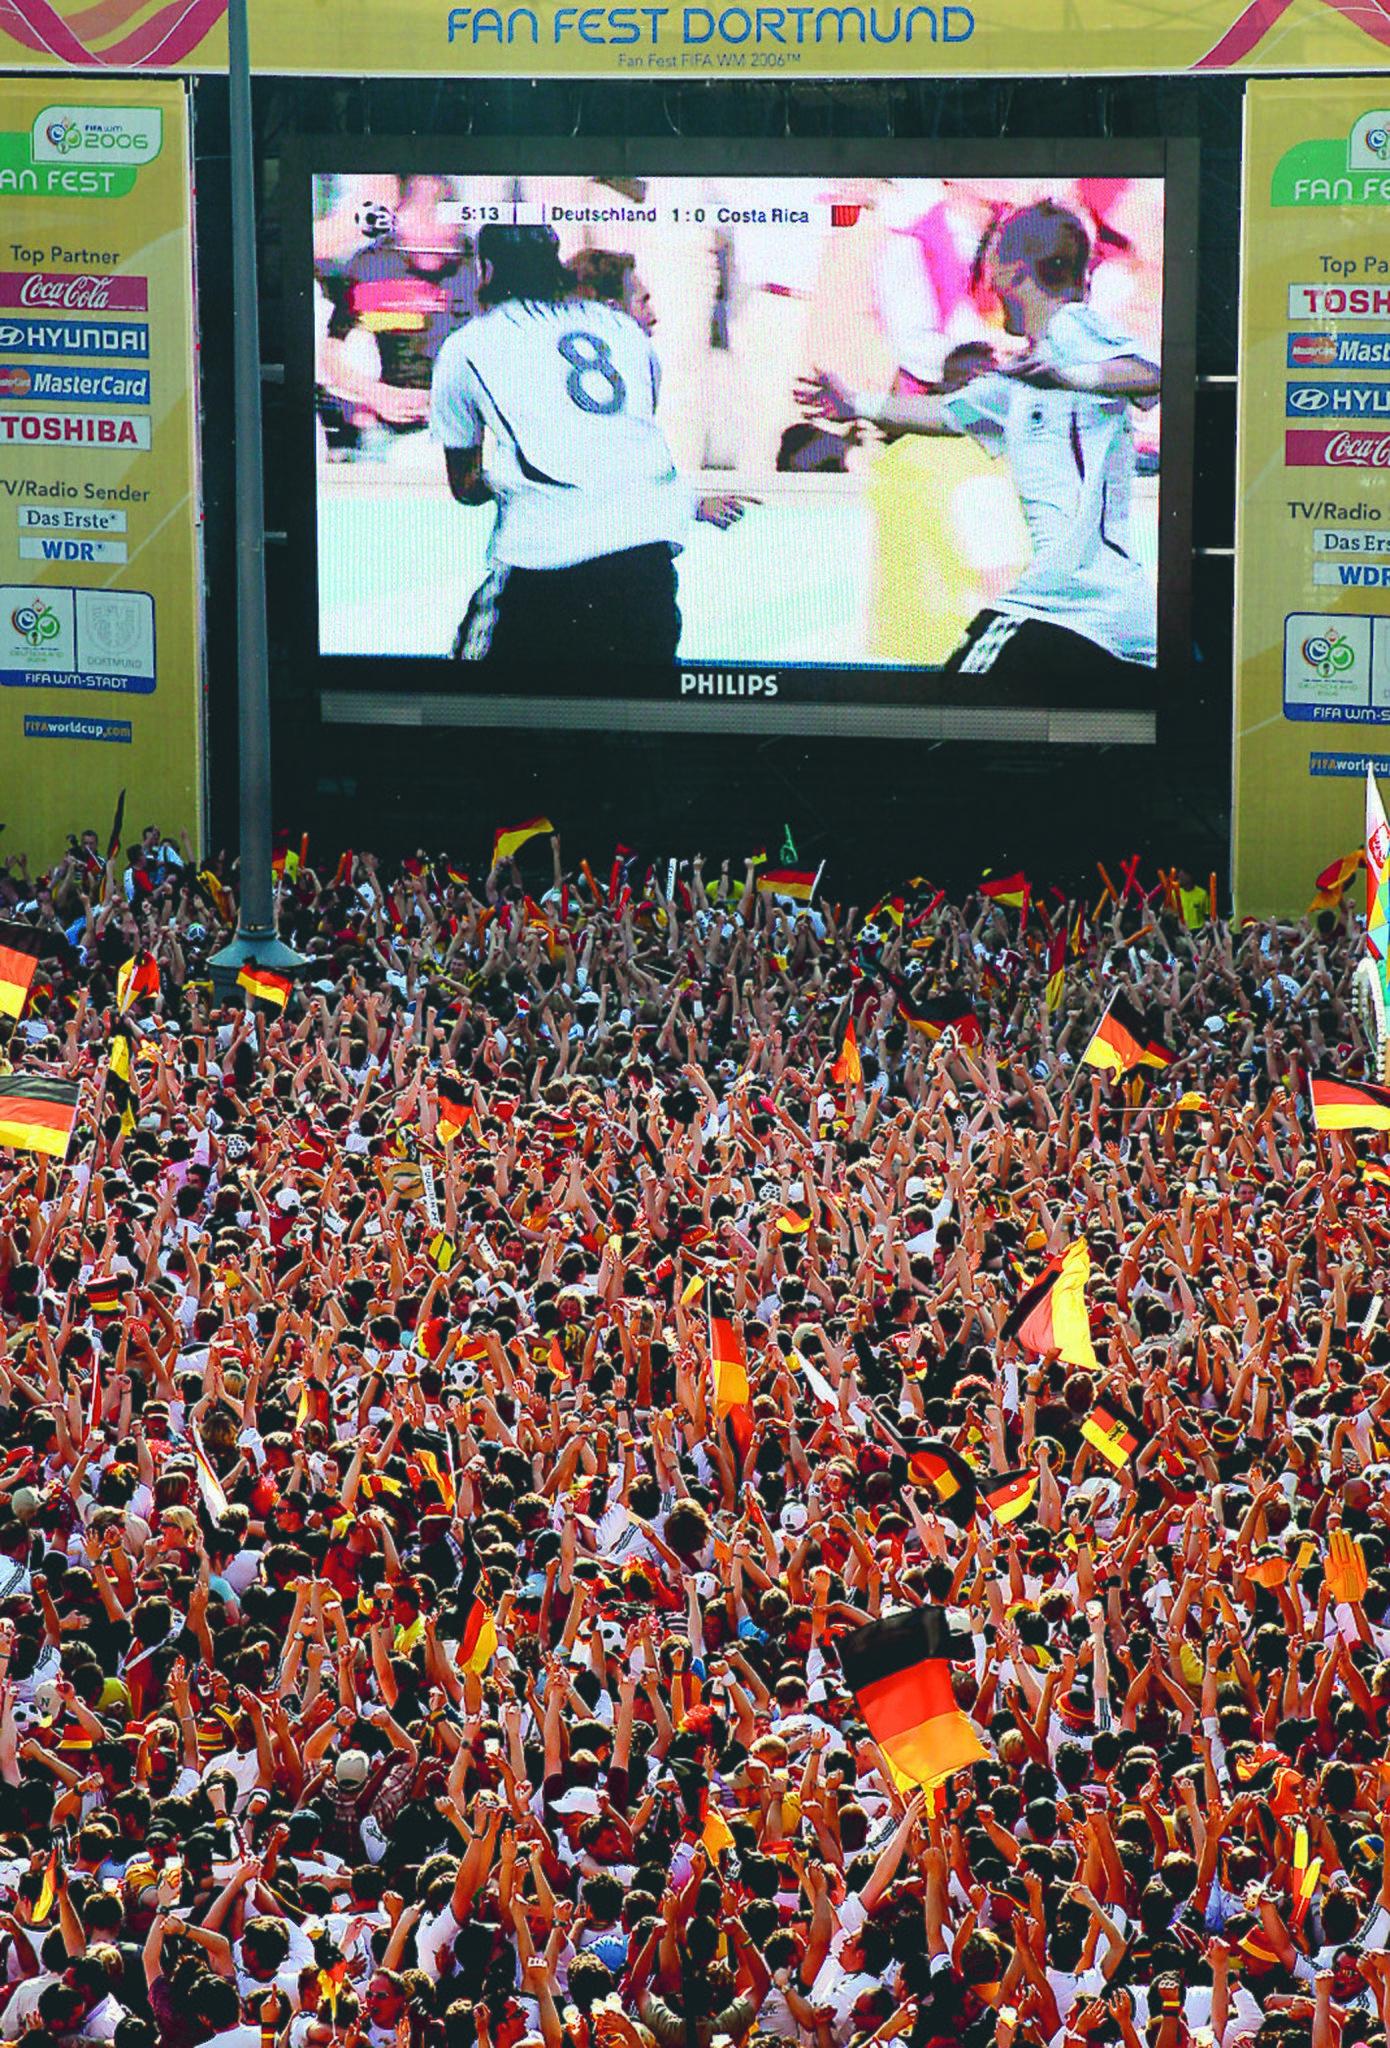 Public Viewing Dortmund